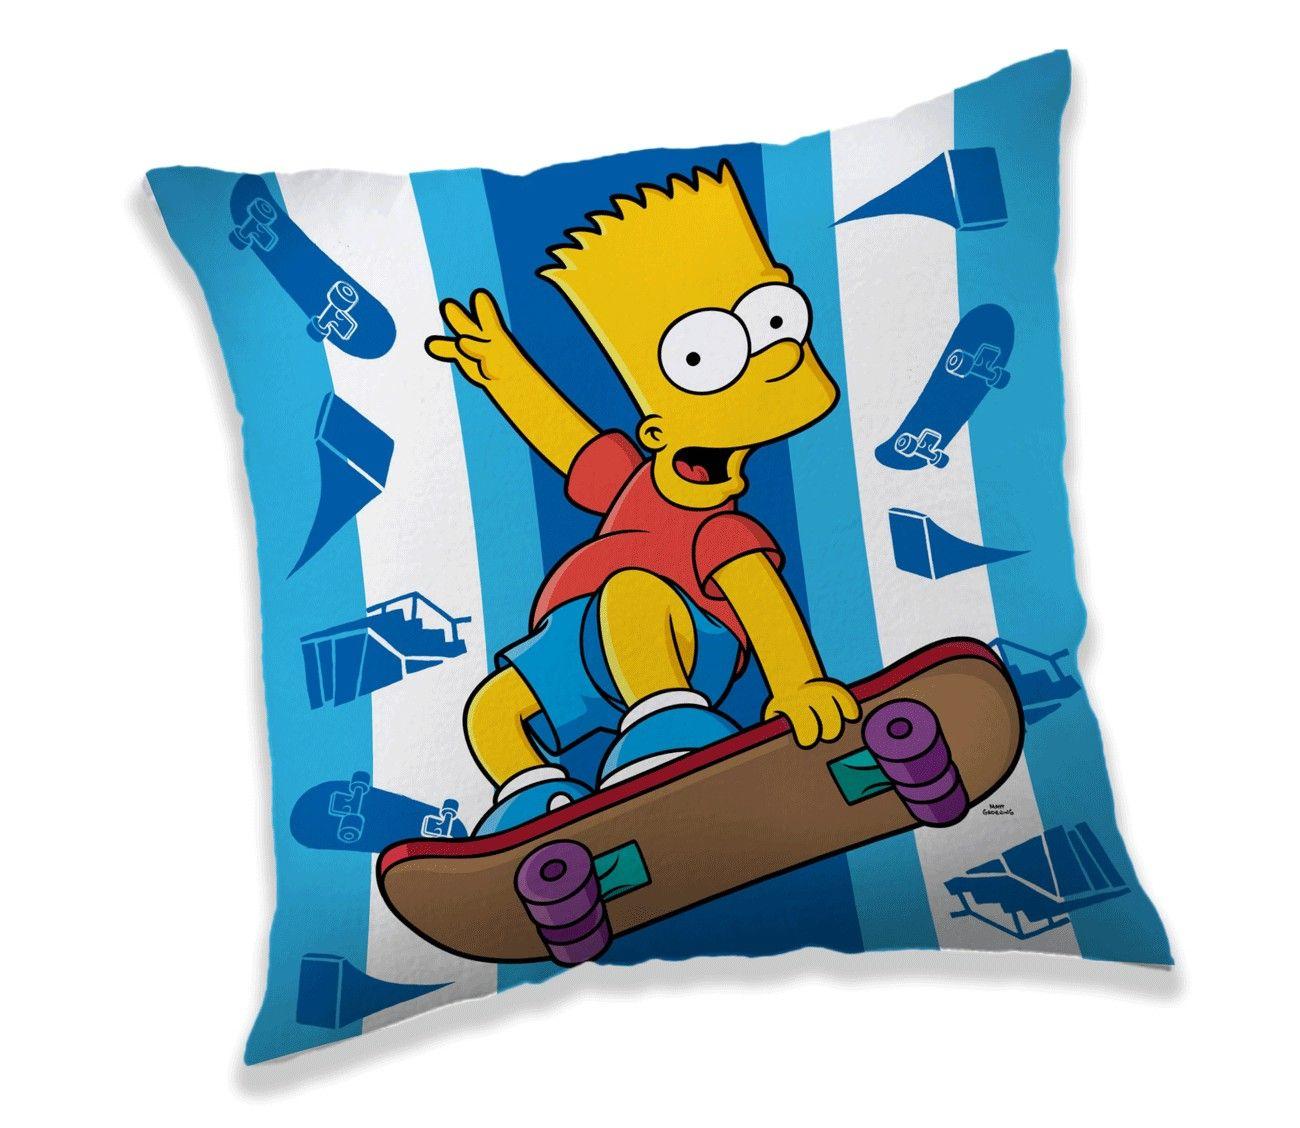 Hezký polštářek Bart Simpson na skatu Jerry Fabrics